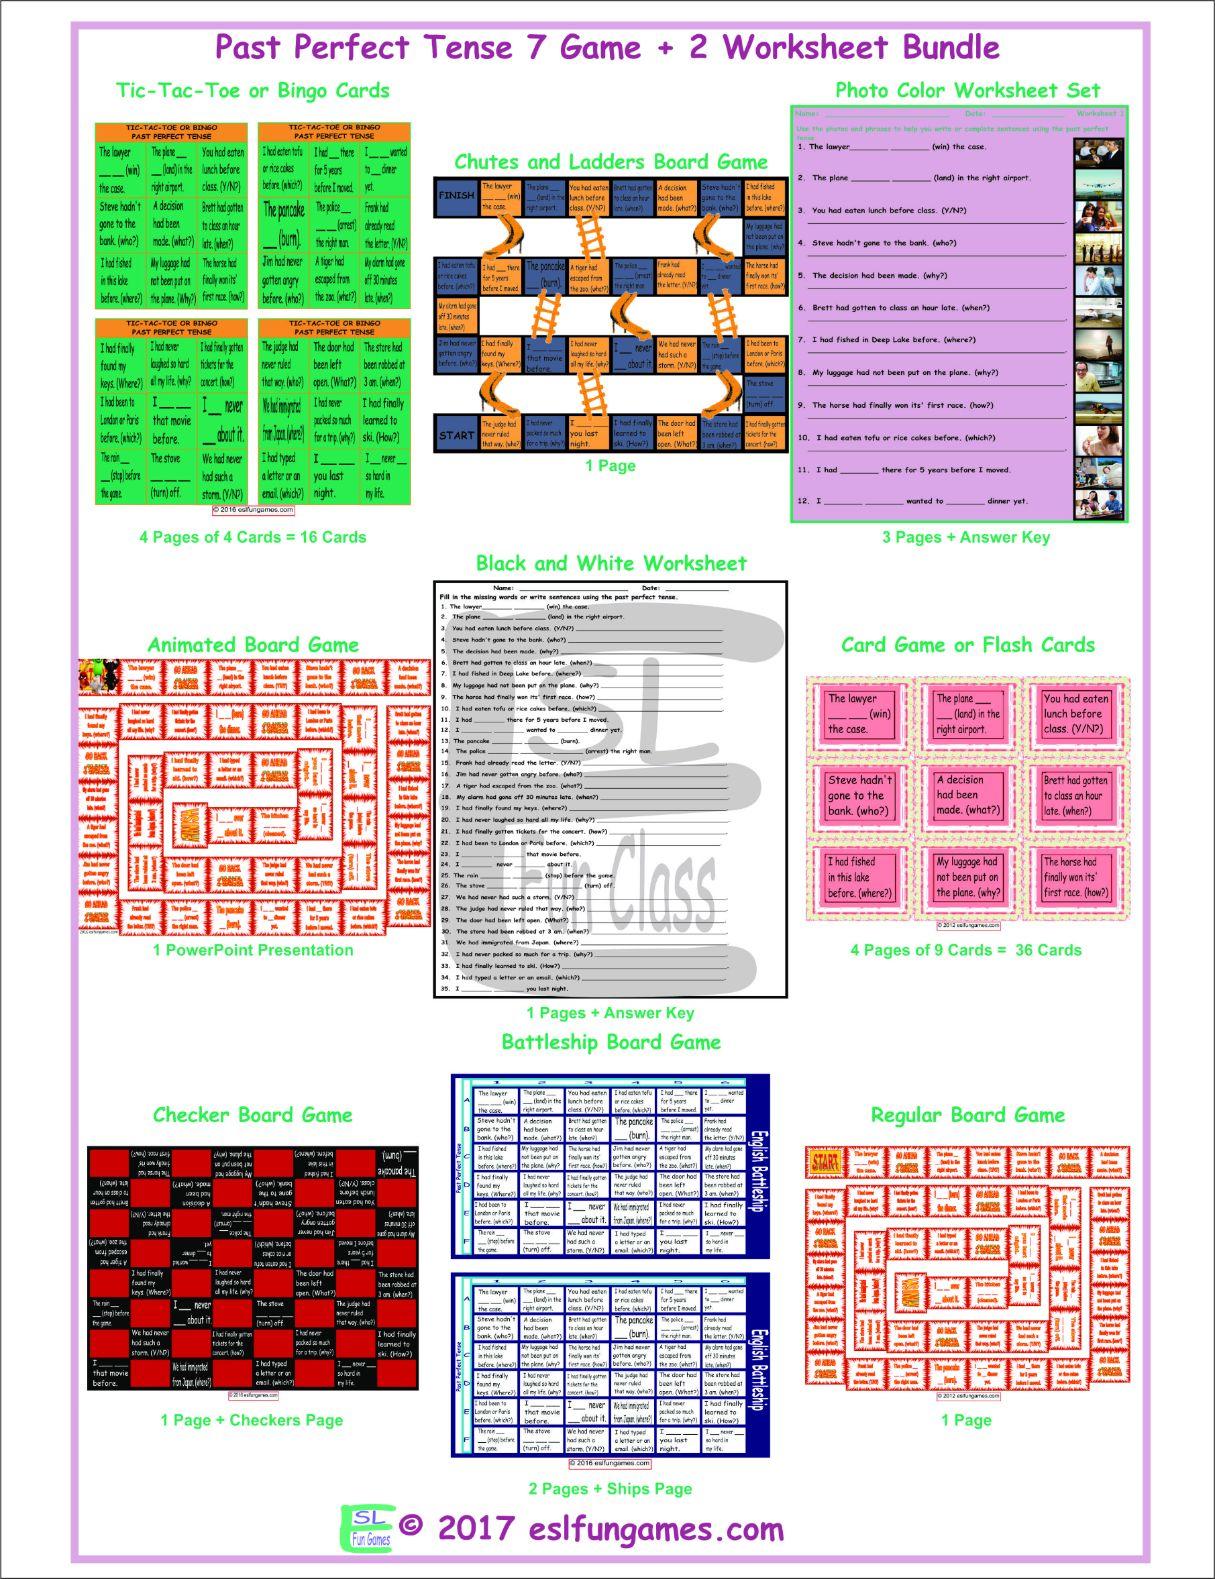 Past Perfect Tense 7 Game Plus 2 Worksheet Bundle